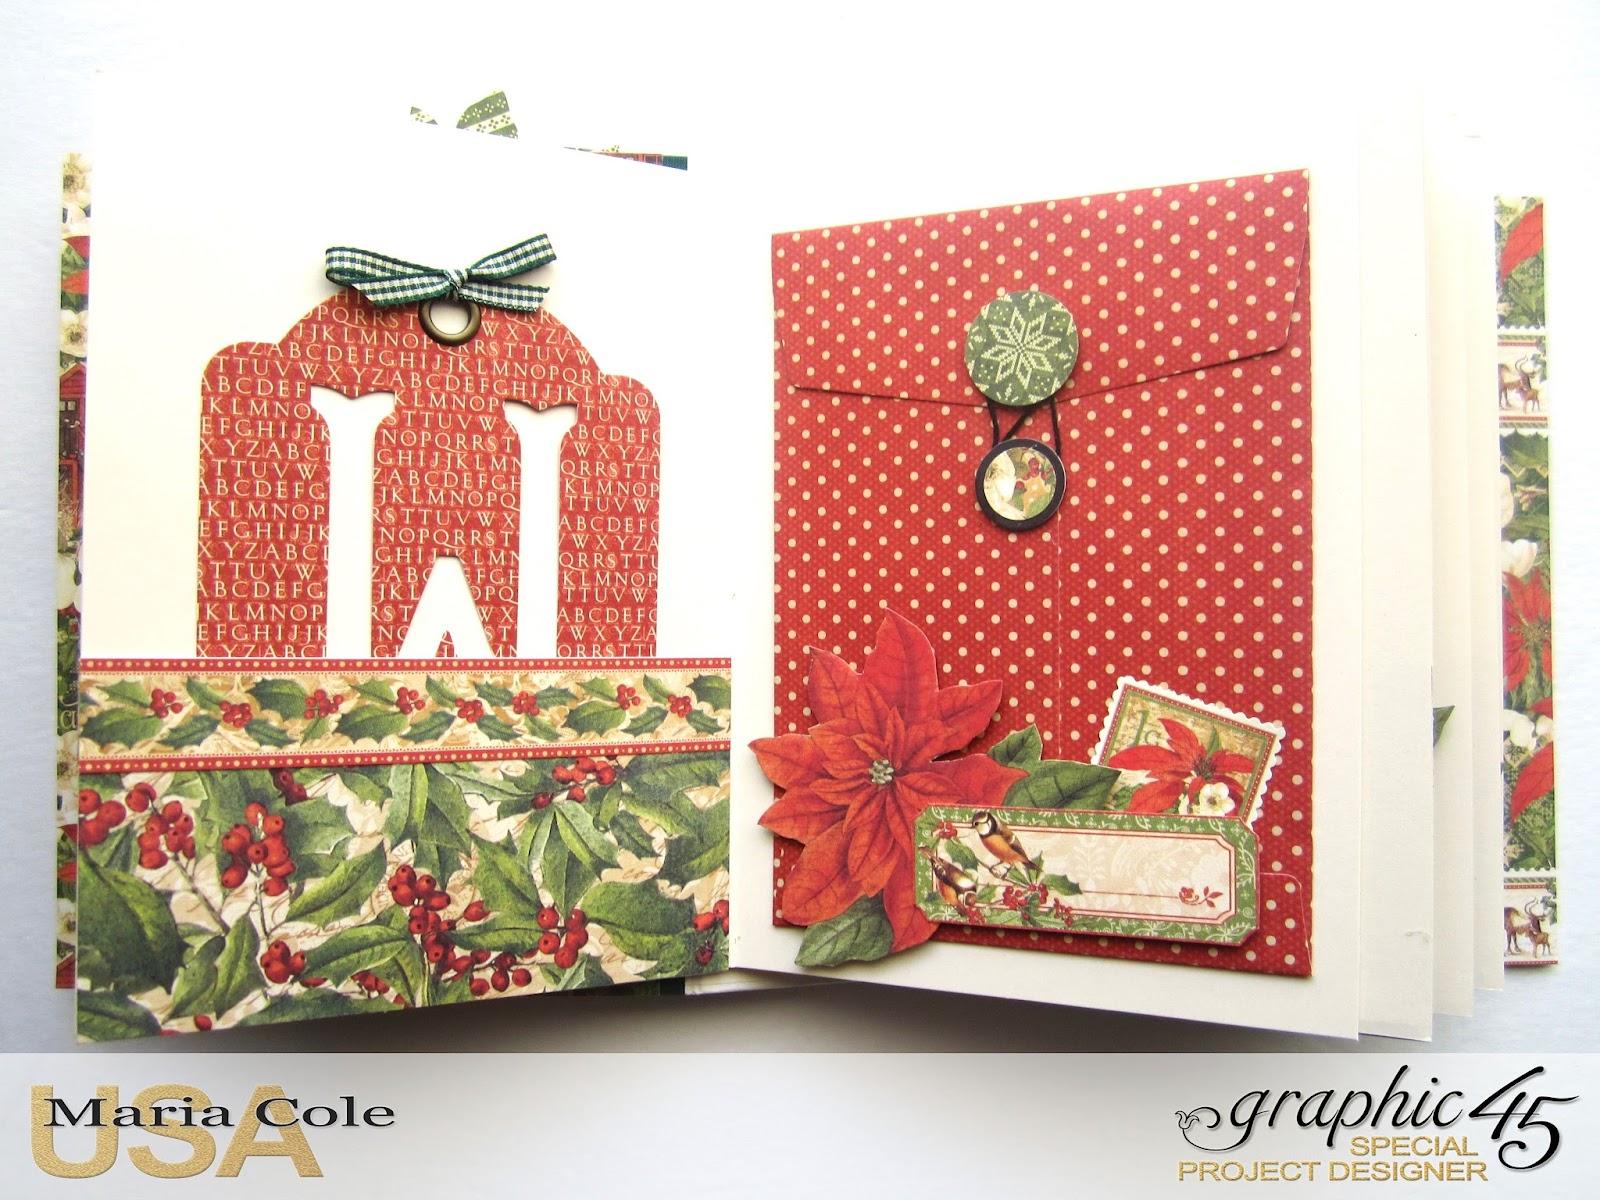 Graphic-45-Winter-Wonderland-Rectangle-Pocket-Album-Maria-Cole-07.jpg